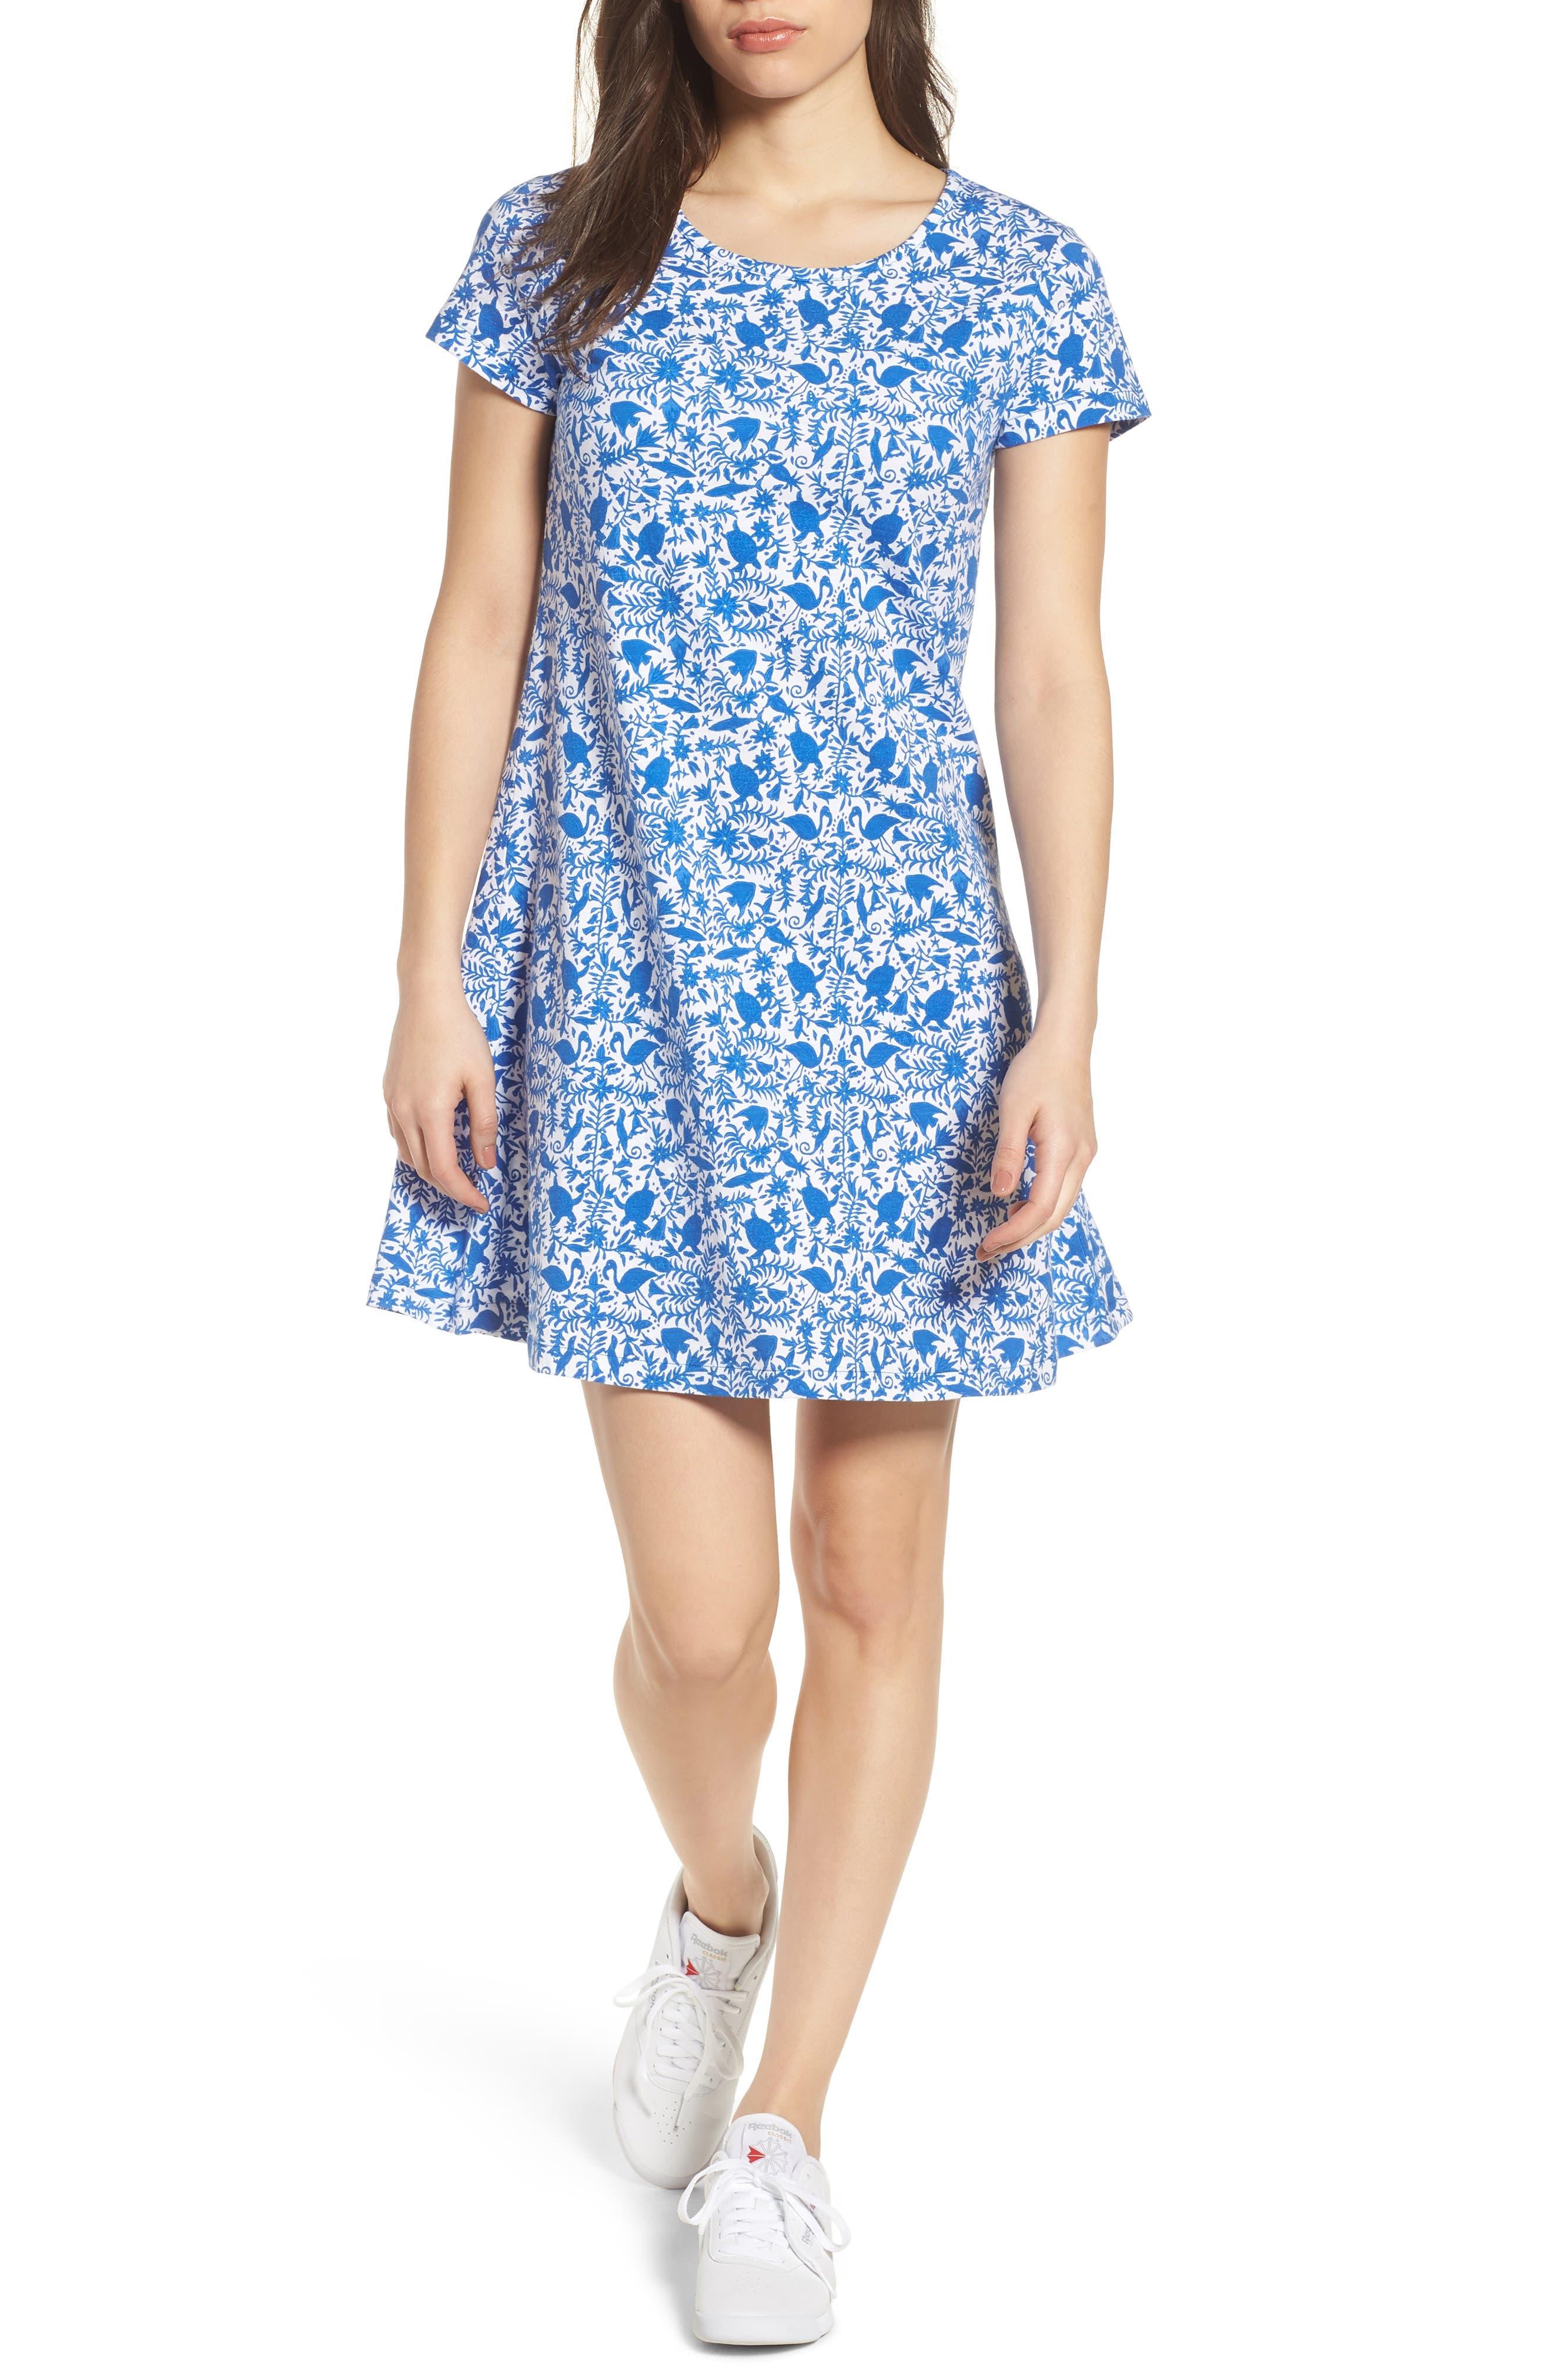 Bahamas Otomi Print Stretch Cotton Dress,                             Main thumbnail 1, color,                             413